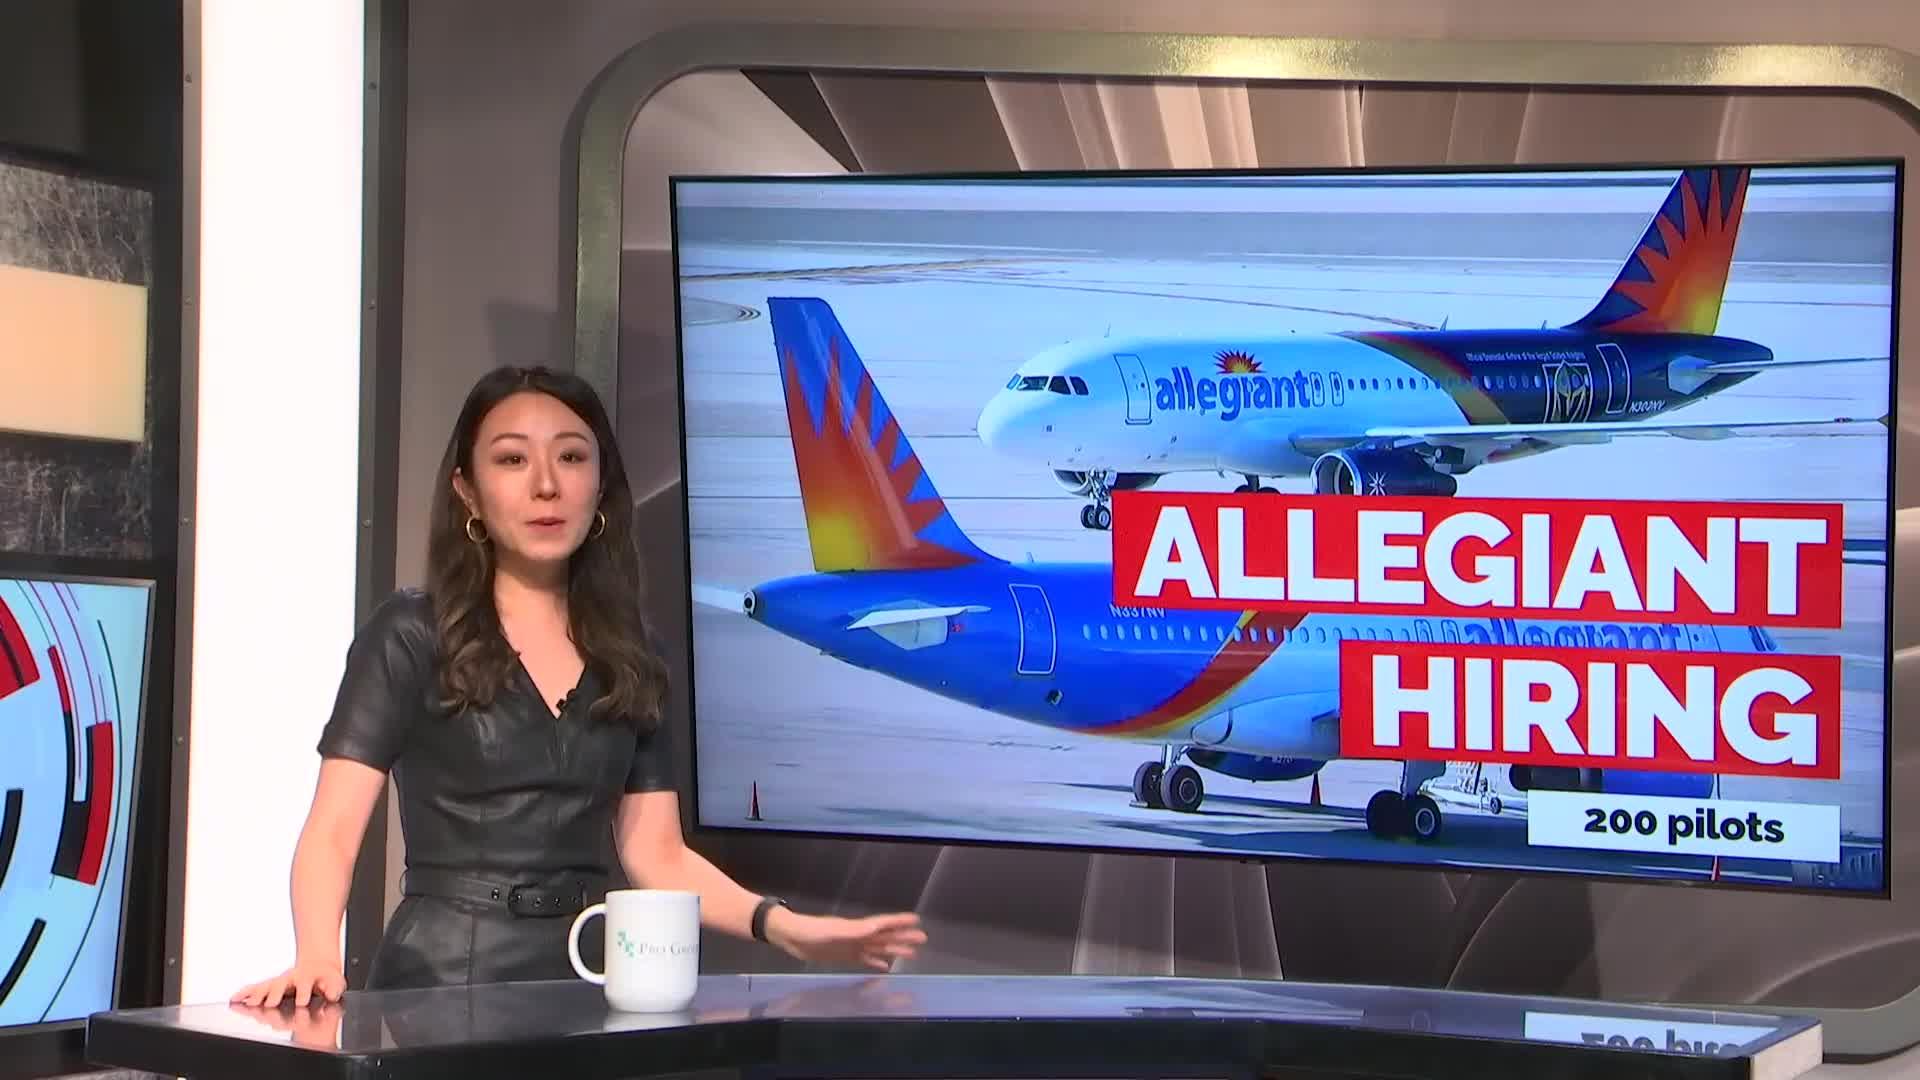 7@7PM Allegiant Hiring Nearly 200 Pilots